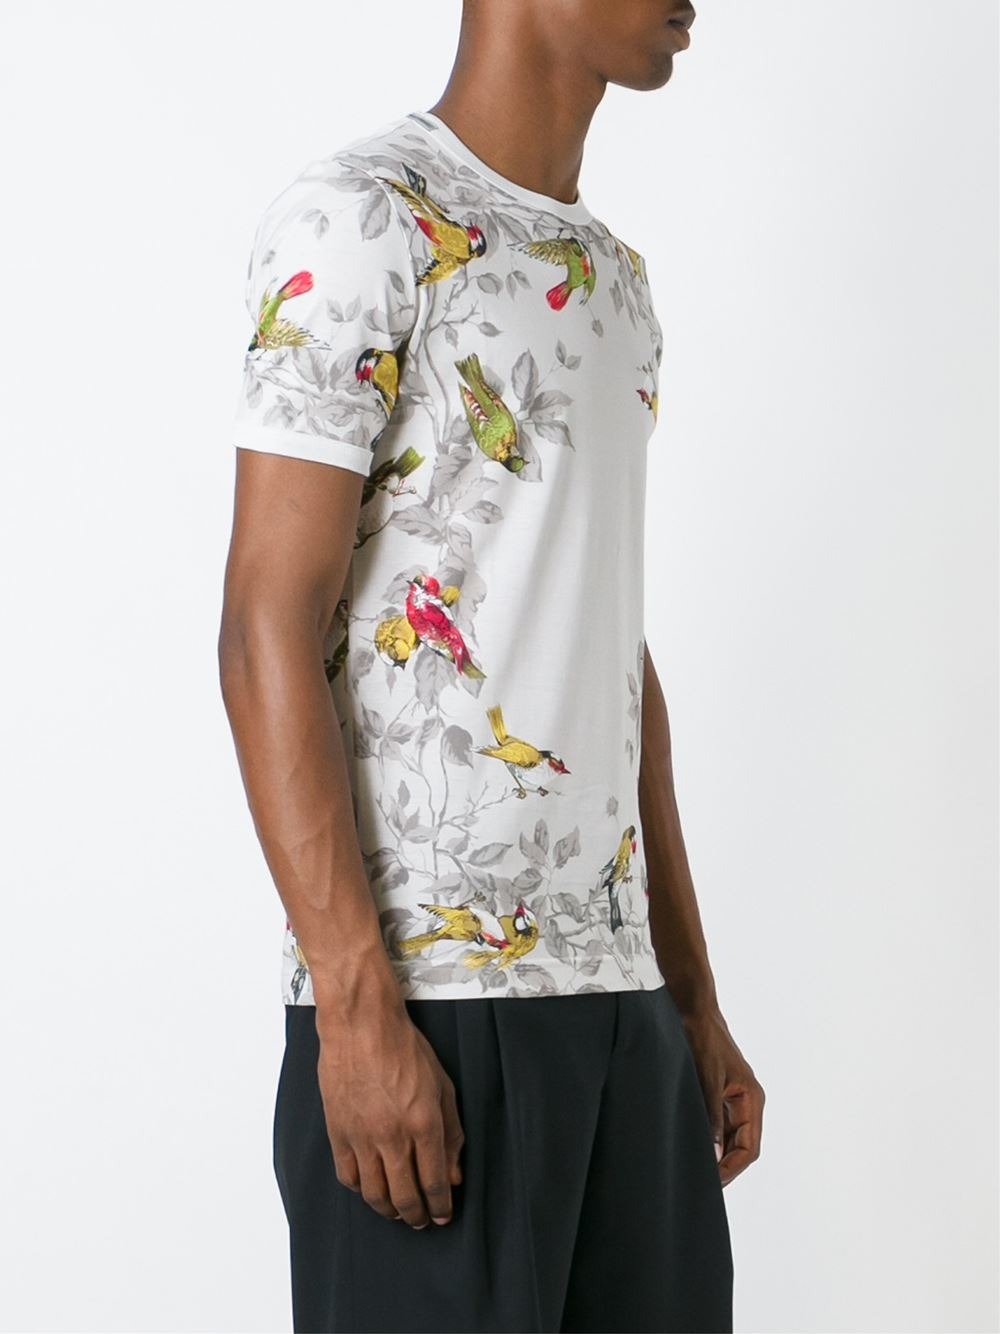 lyst dolce gabbana bird print t shirt in gray for men. Black Bedroom Furniture Sets. Home Design Ideas